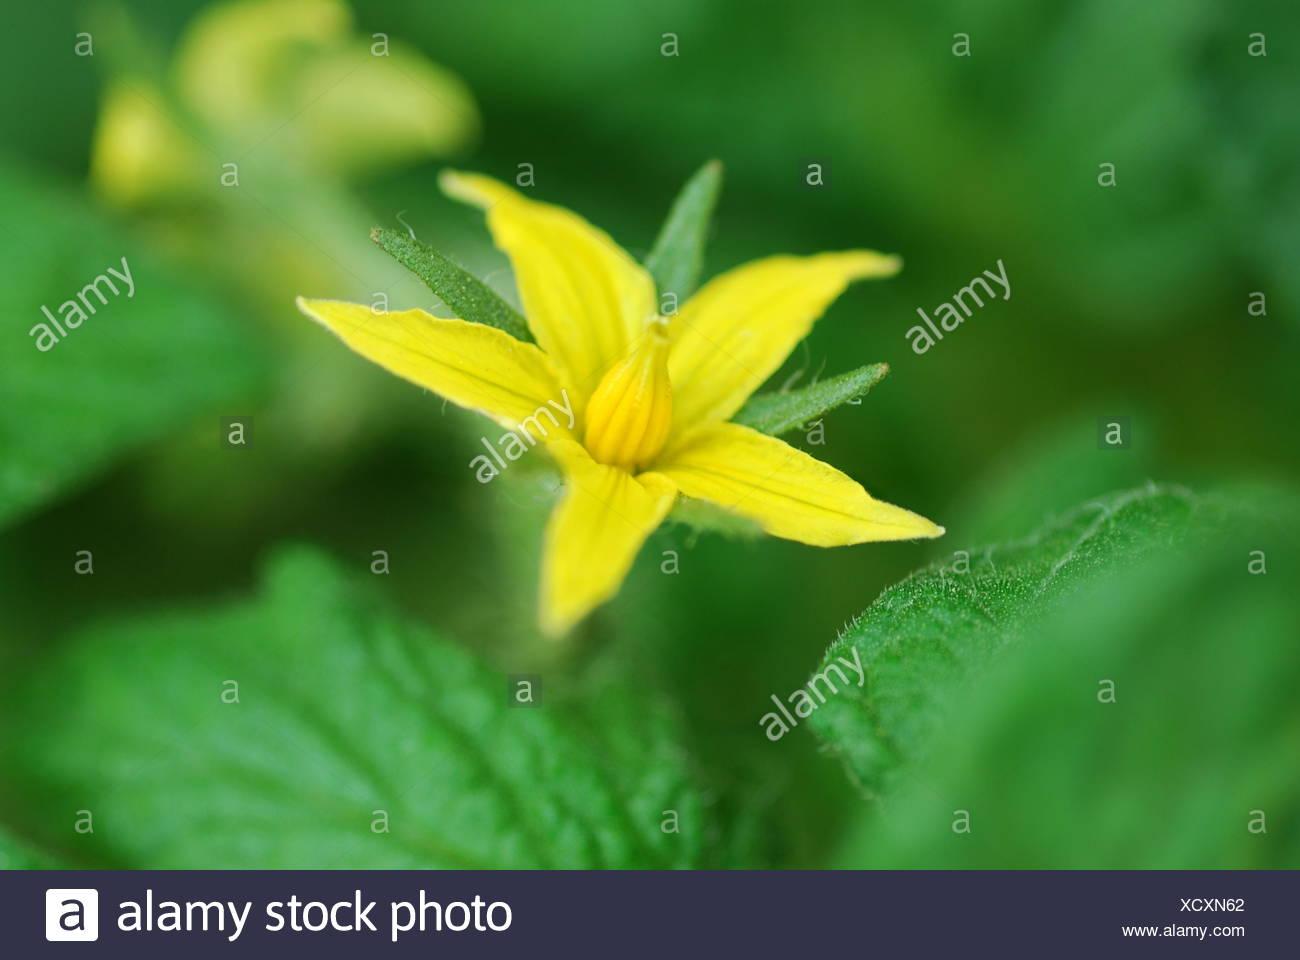 tomato blossom (solanum lycopersicum) - Stock Image